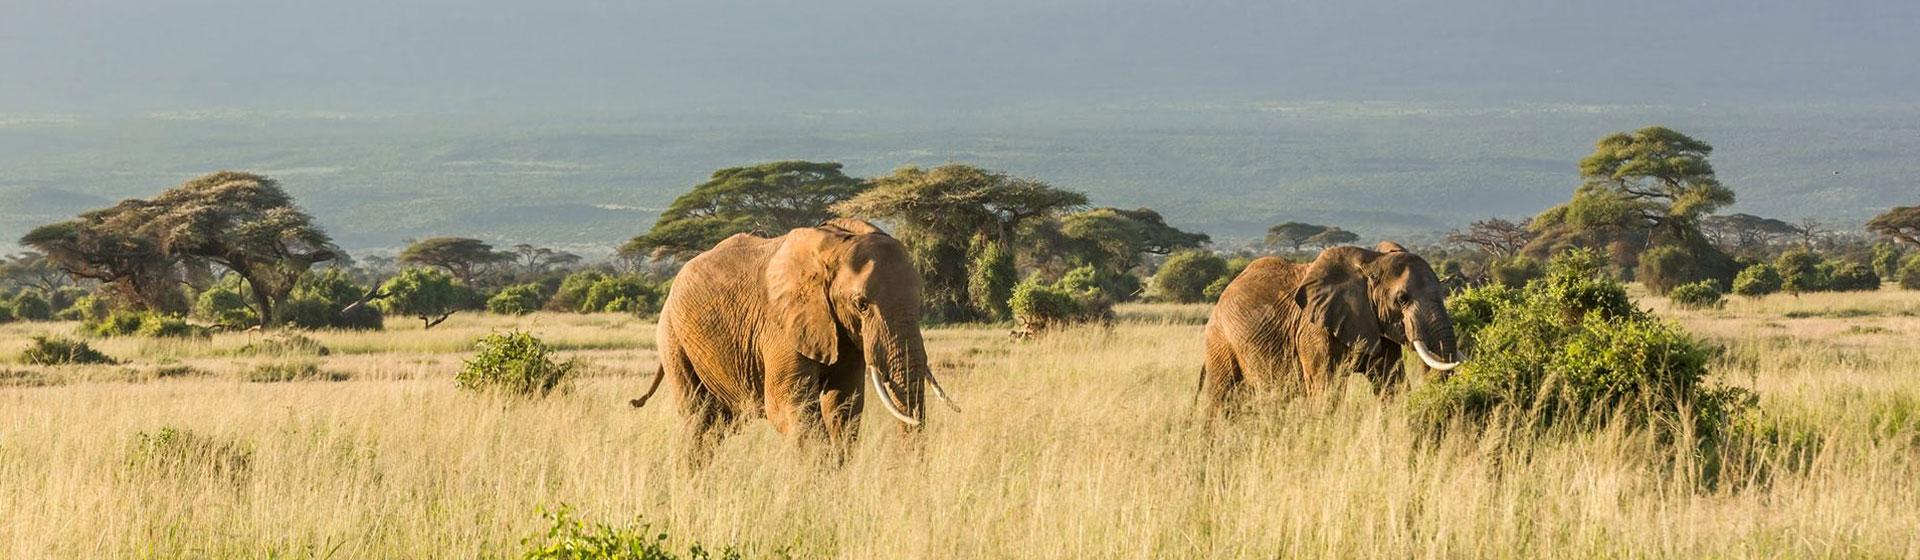 East Africa Destinations